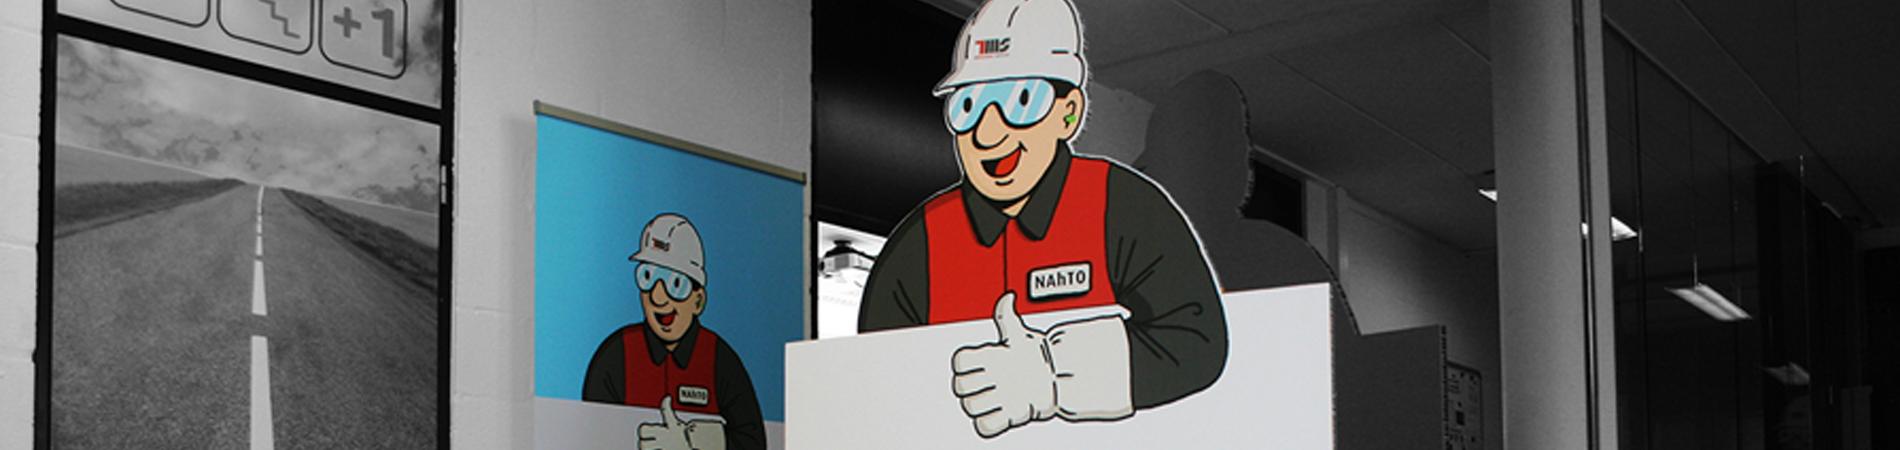 TMS-Nahto-preventiedienst-Banner TMS industrial services